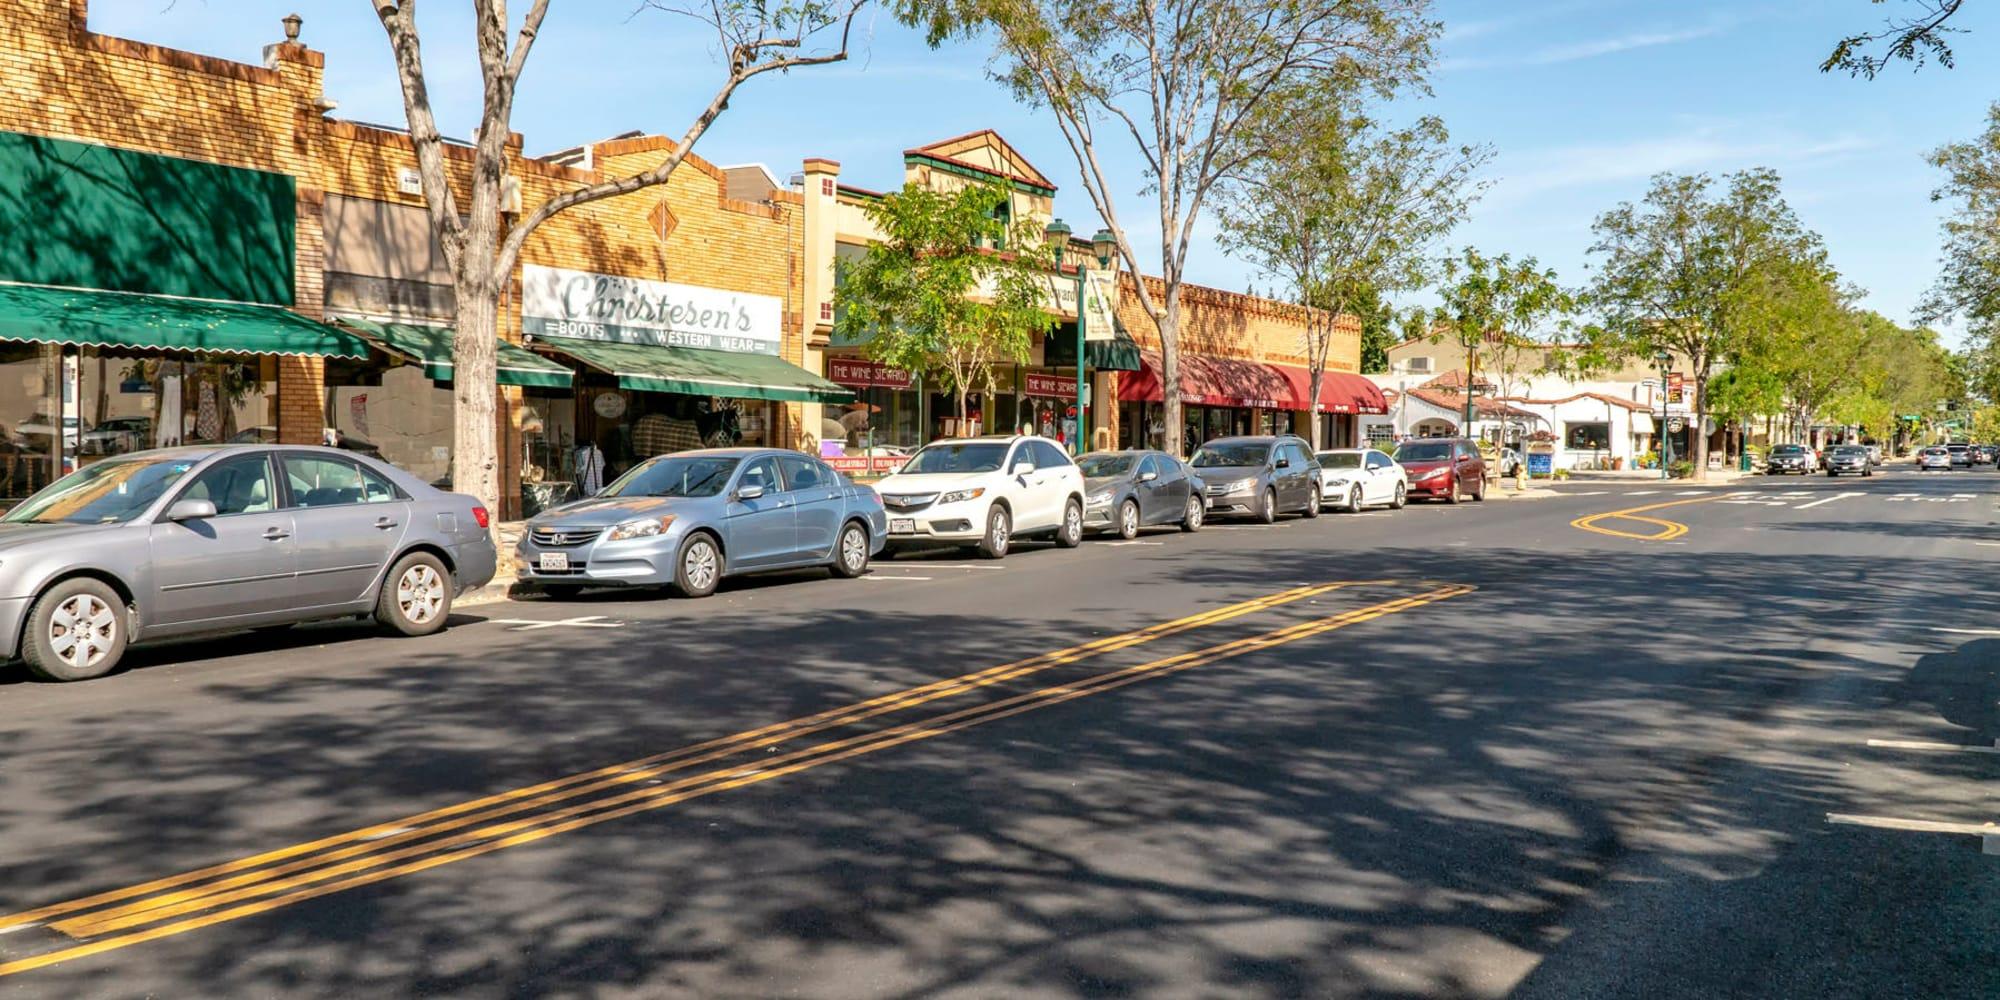 Retail shops on a downtown street near Pleasanton Heights in Pleasanton, California